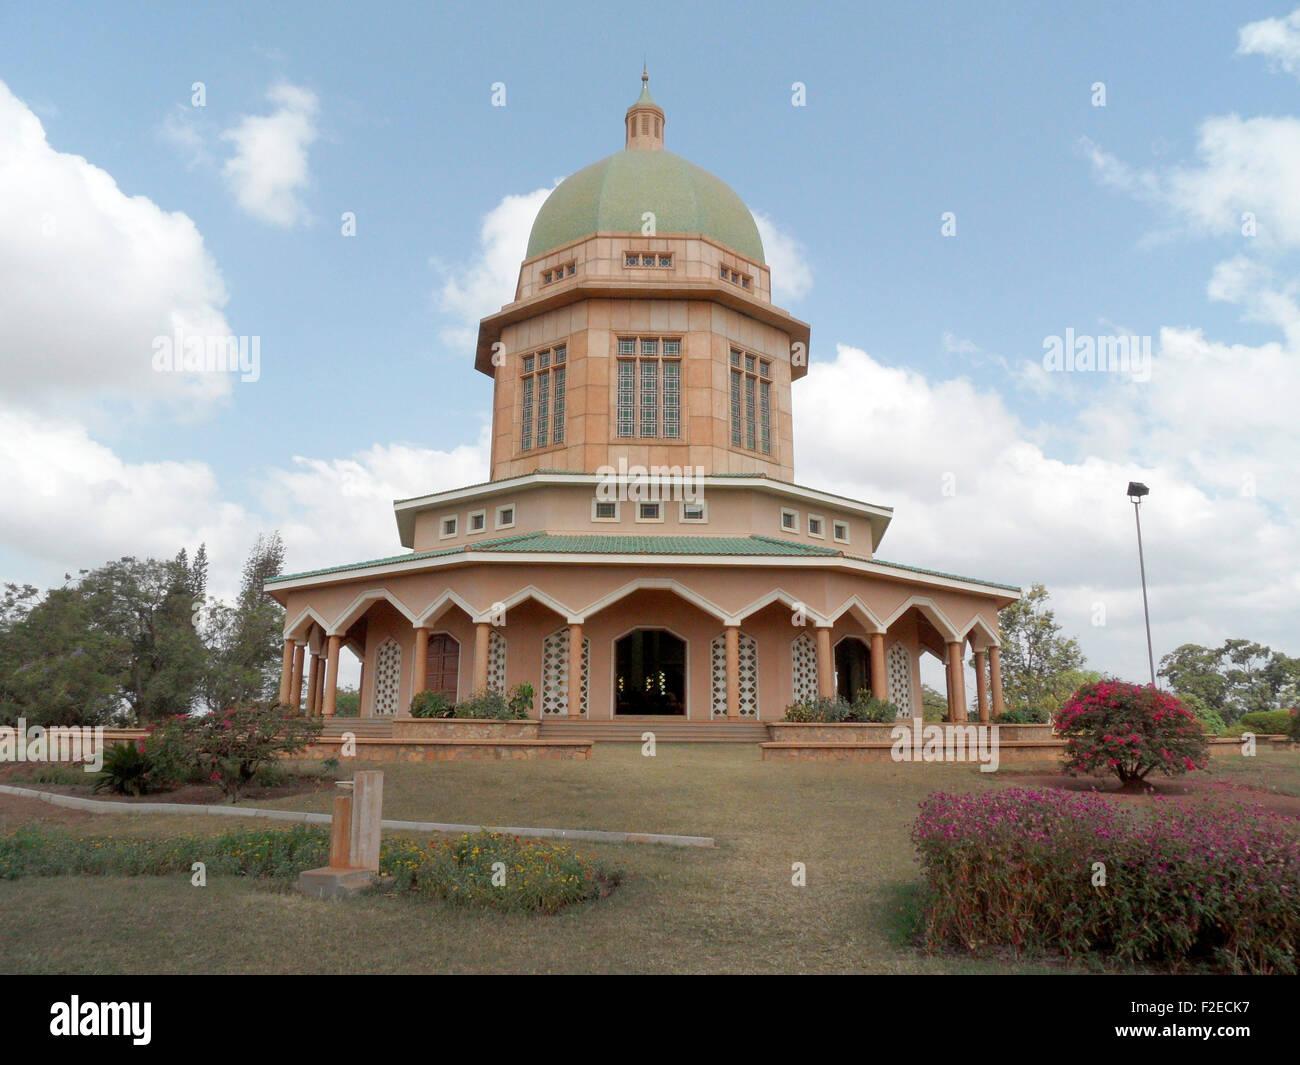 Moschee, Kampala, Februar 2011, Uganda. - Stock Image